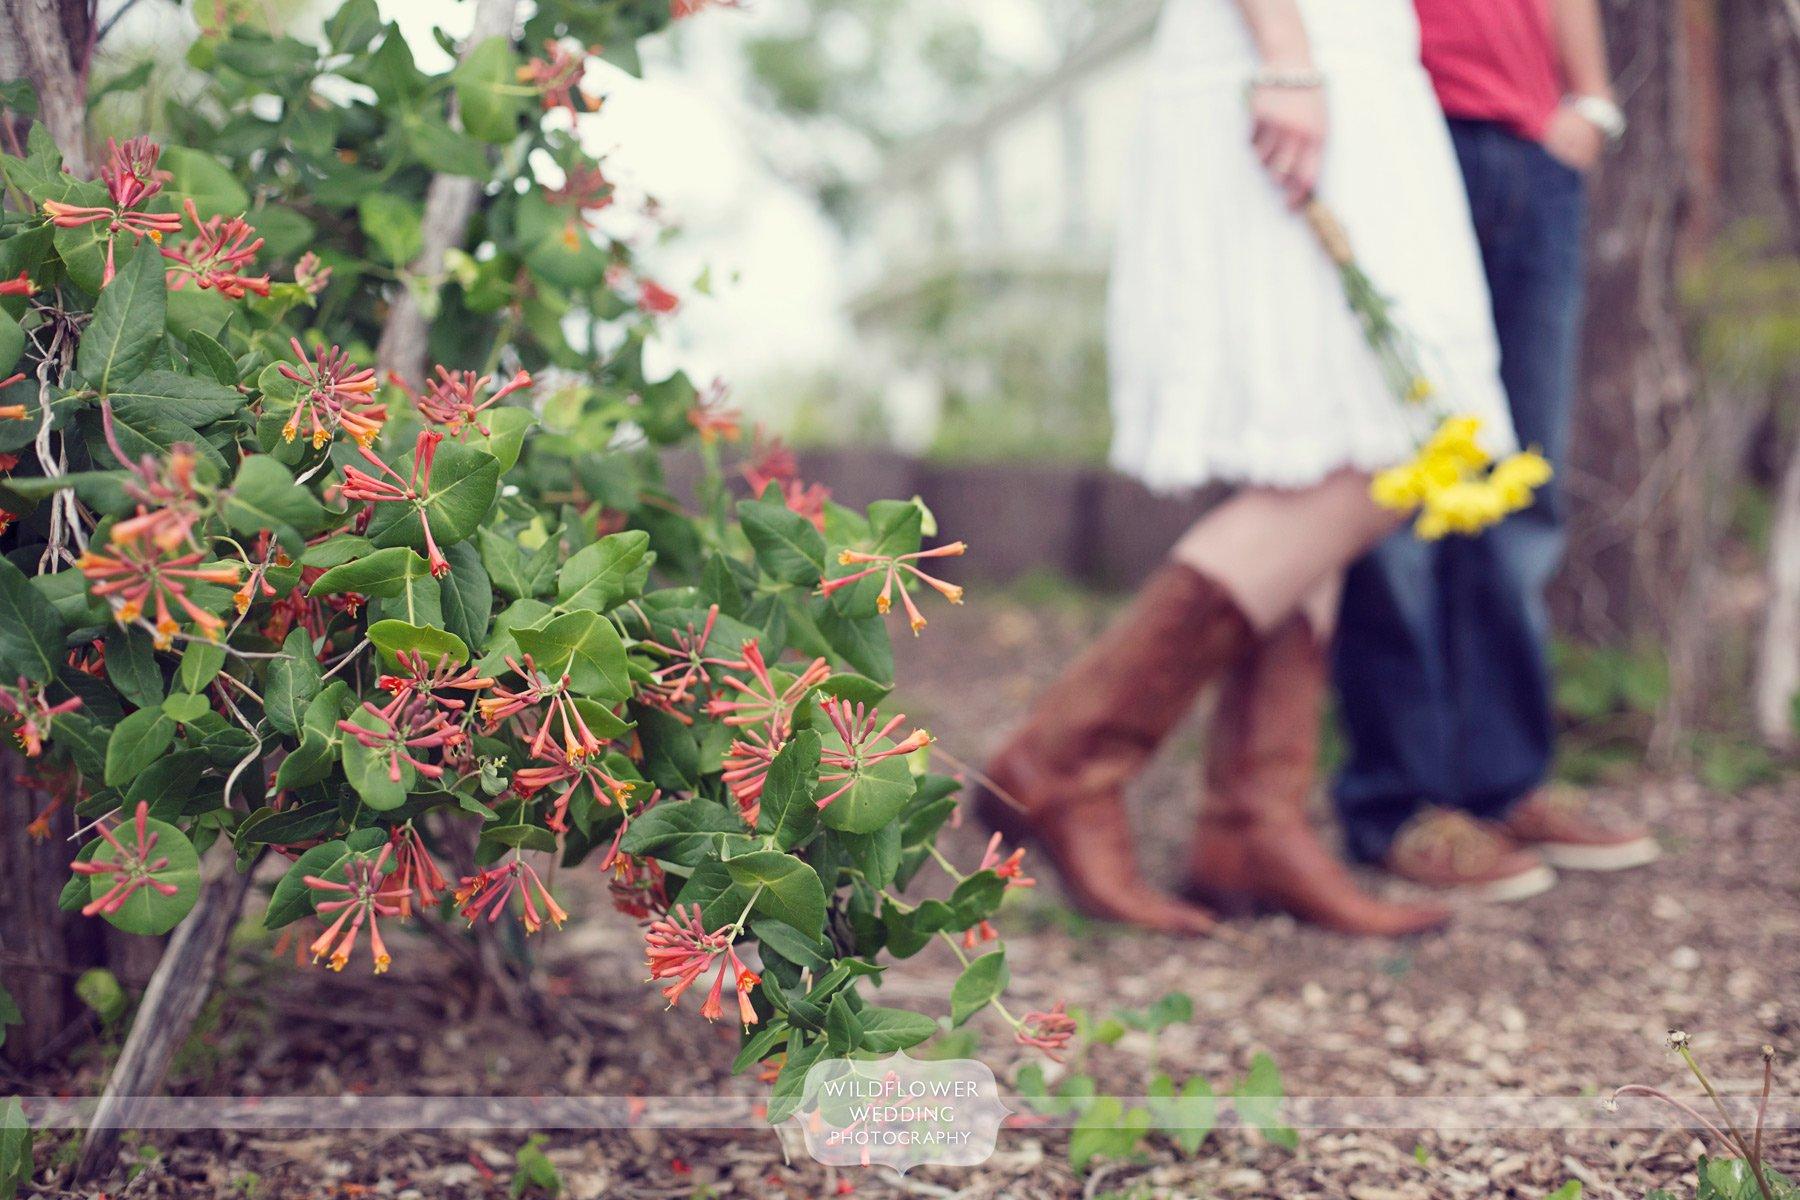 vintage-engagement-photos-blue-bell-farm-mo-02